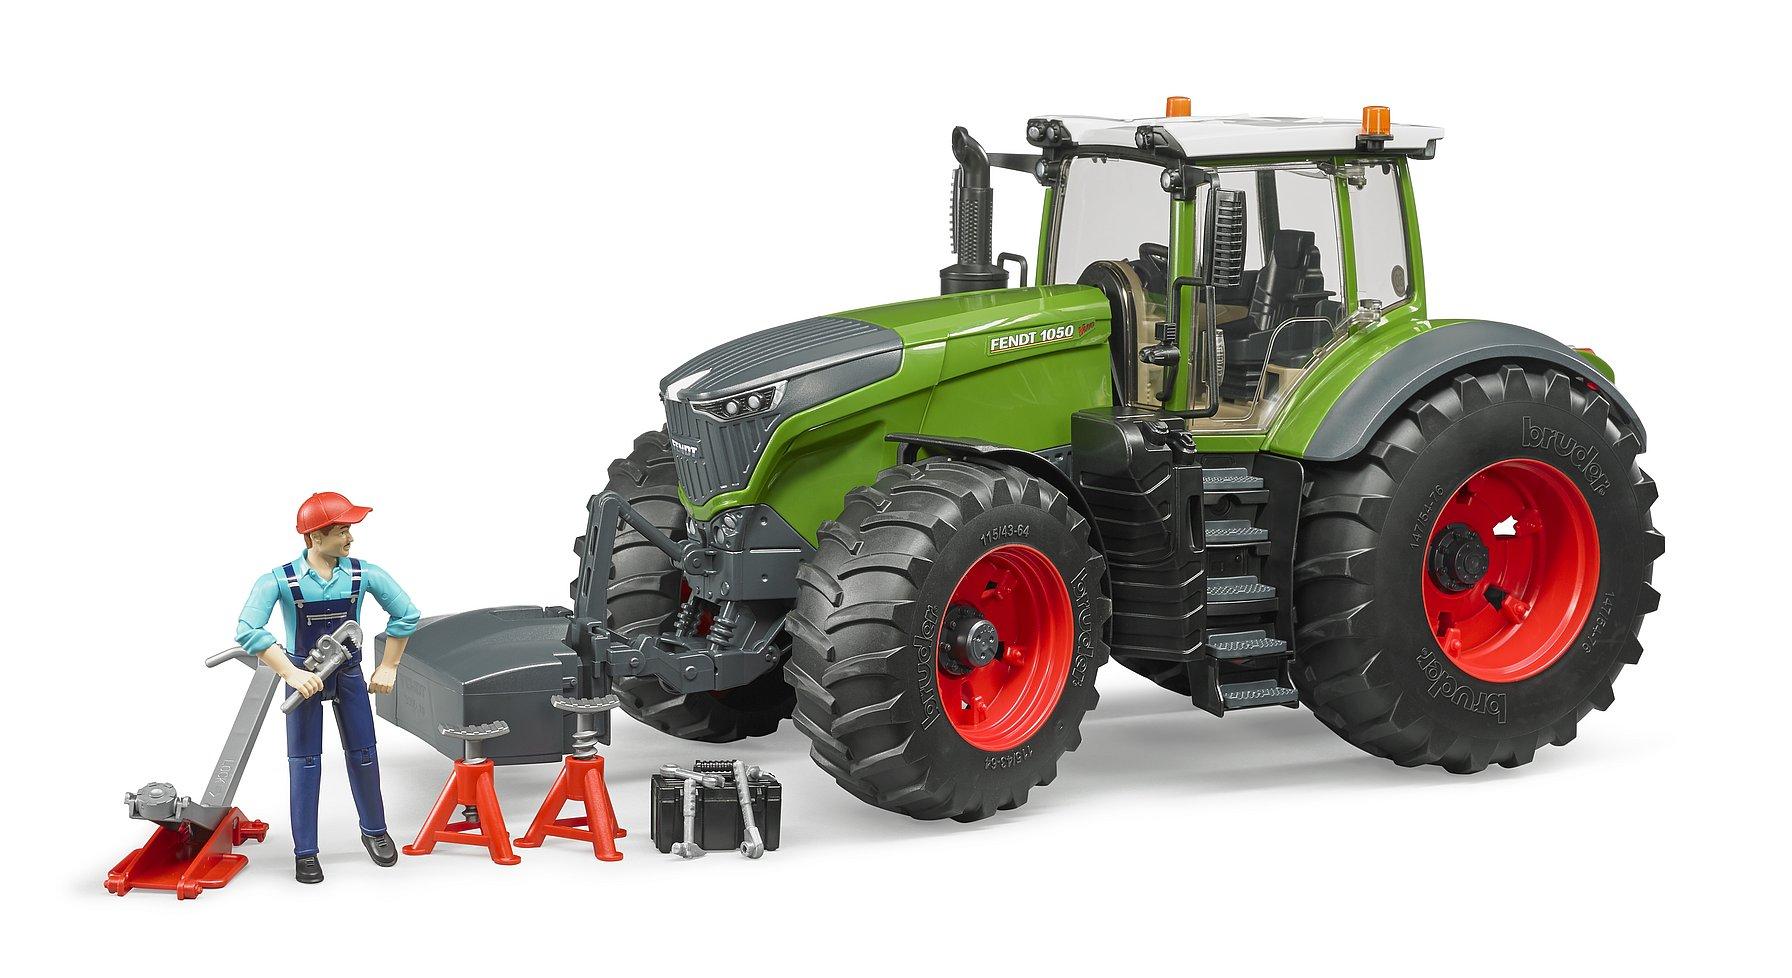 Bruder Traktor Fendt 1050 Vario s mechanikem a dílenským nářadím 1:16